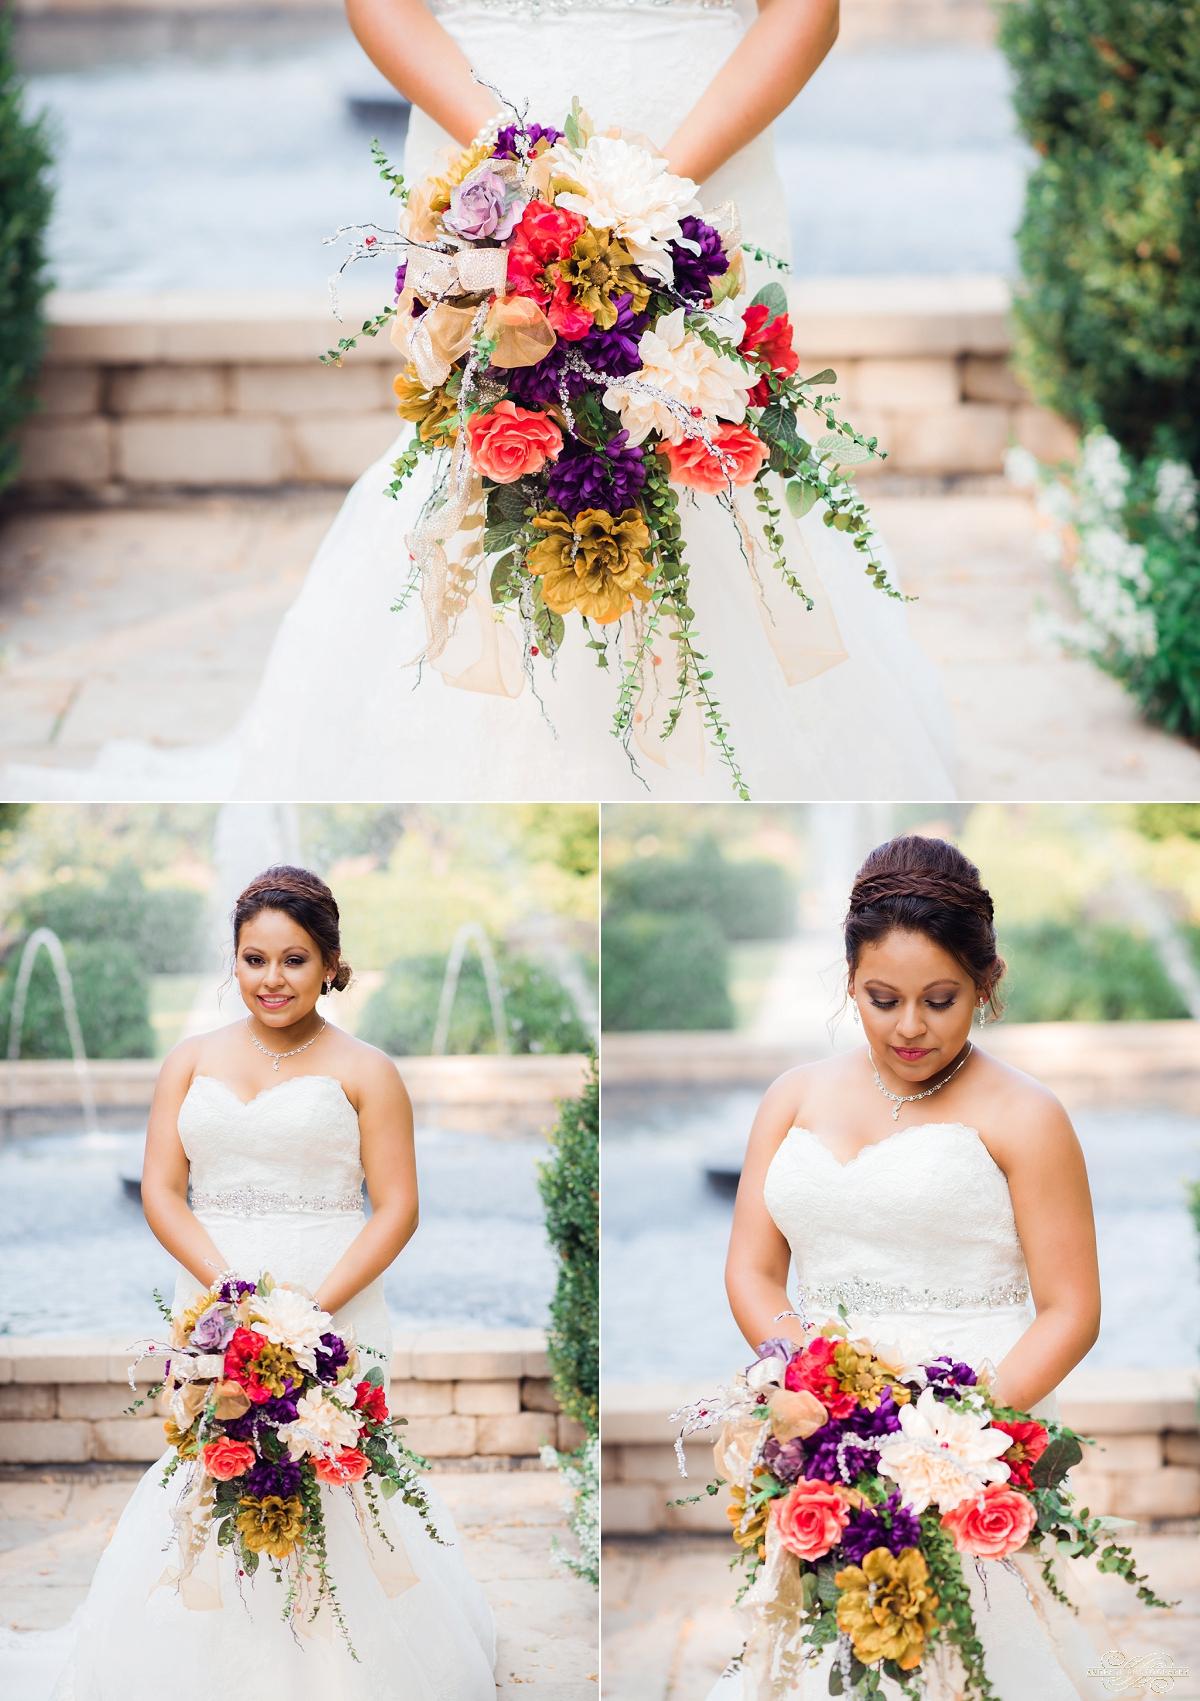 Janette + Louie Estebans Wedding Photography in Naperville - Naperville Wedding Photographer_0050.jpg